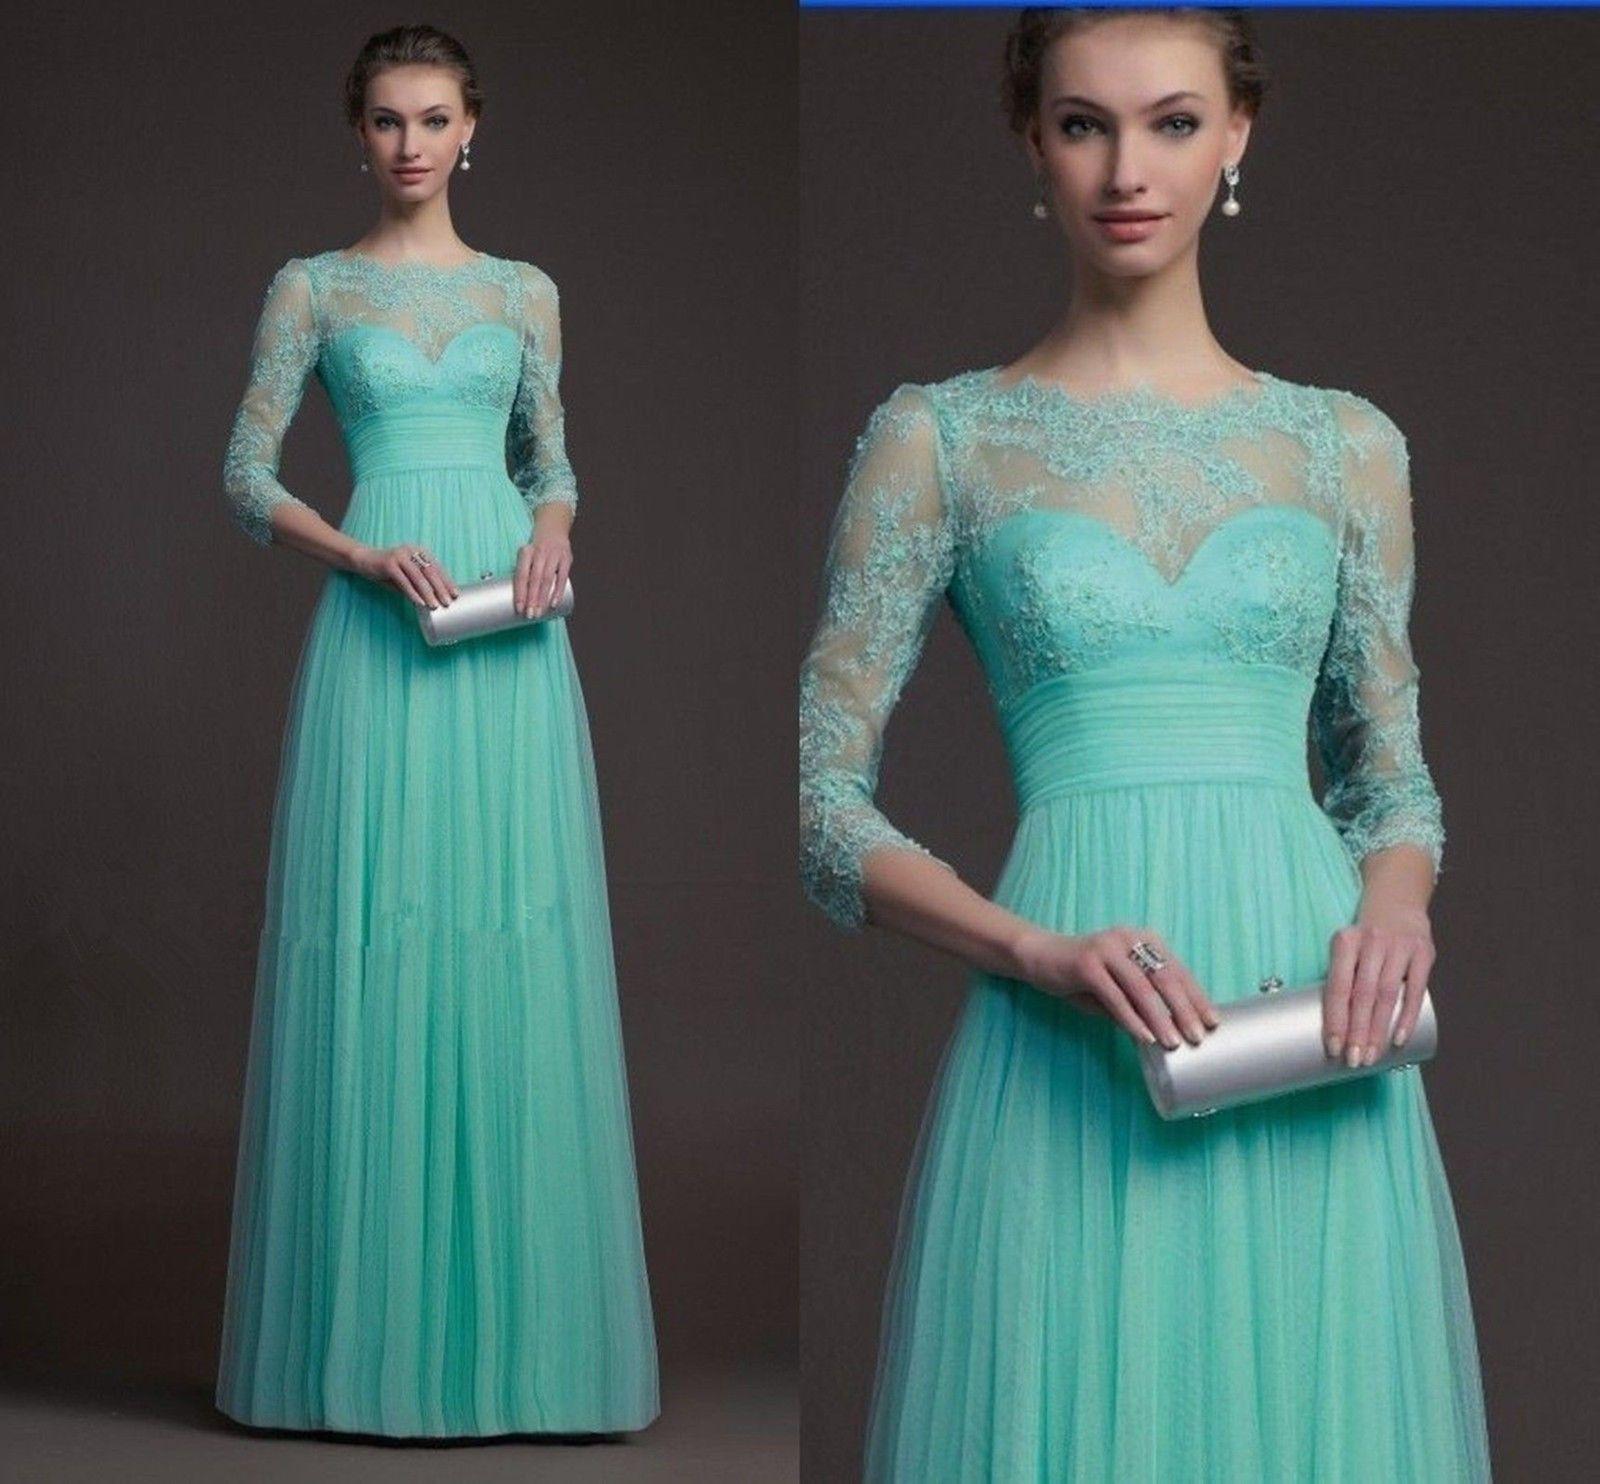 17 Genial Abendkleid Ebay Design Coolste Abendkleid Ebay Design